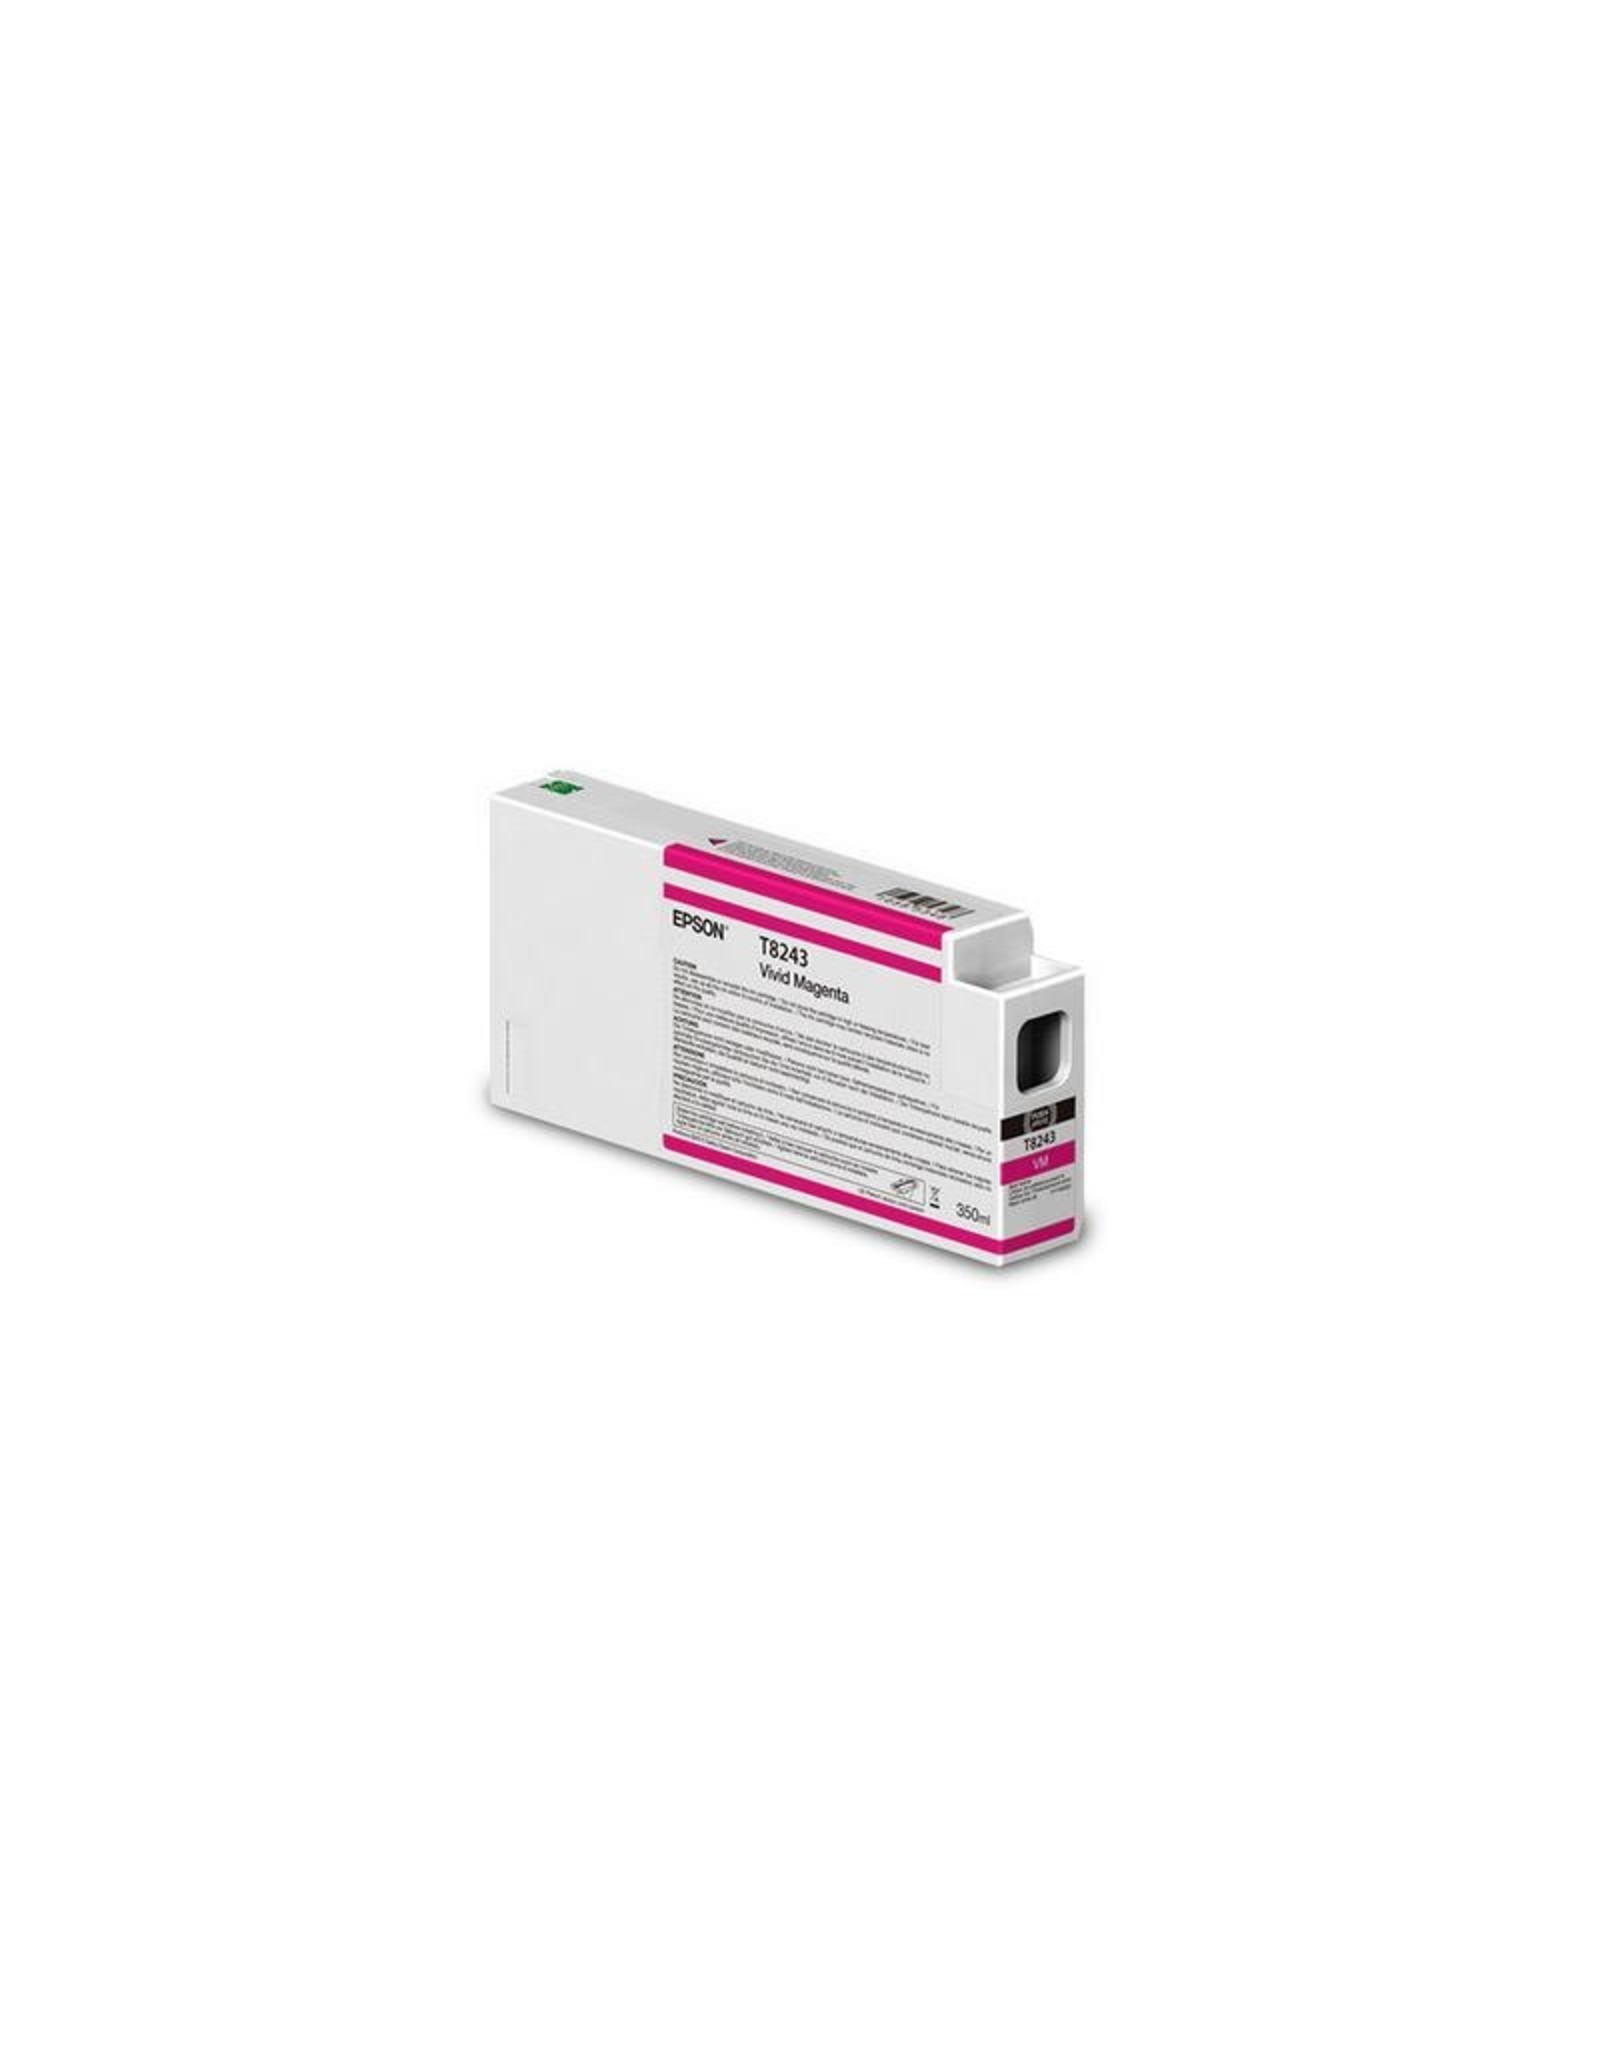 Epson Epson T824300 Ultrachrome HD Vivid Magenta Ink 350ML